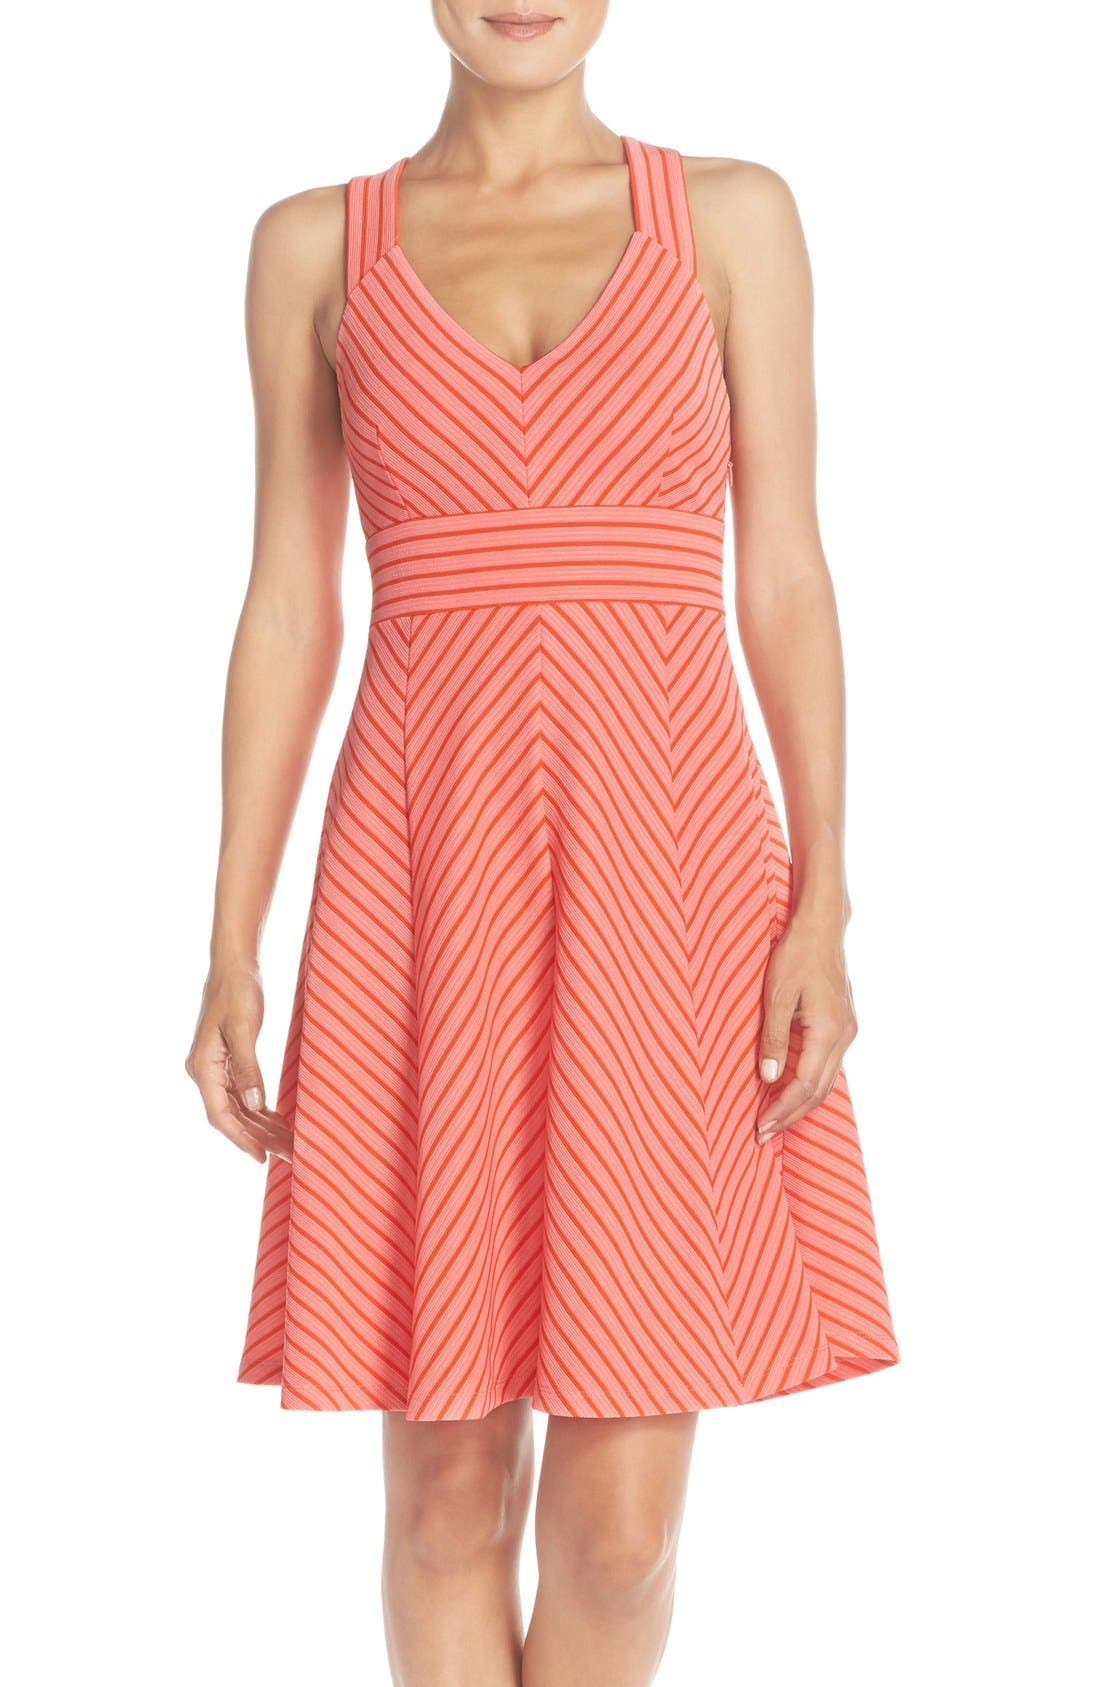 Alternate Image 1 Selected - Adrianna Papell Stripe Ottoman Knit Sundress (Petite)